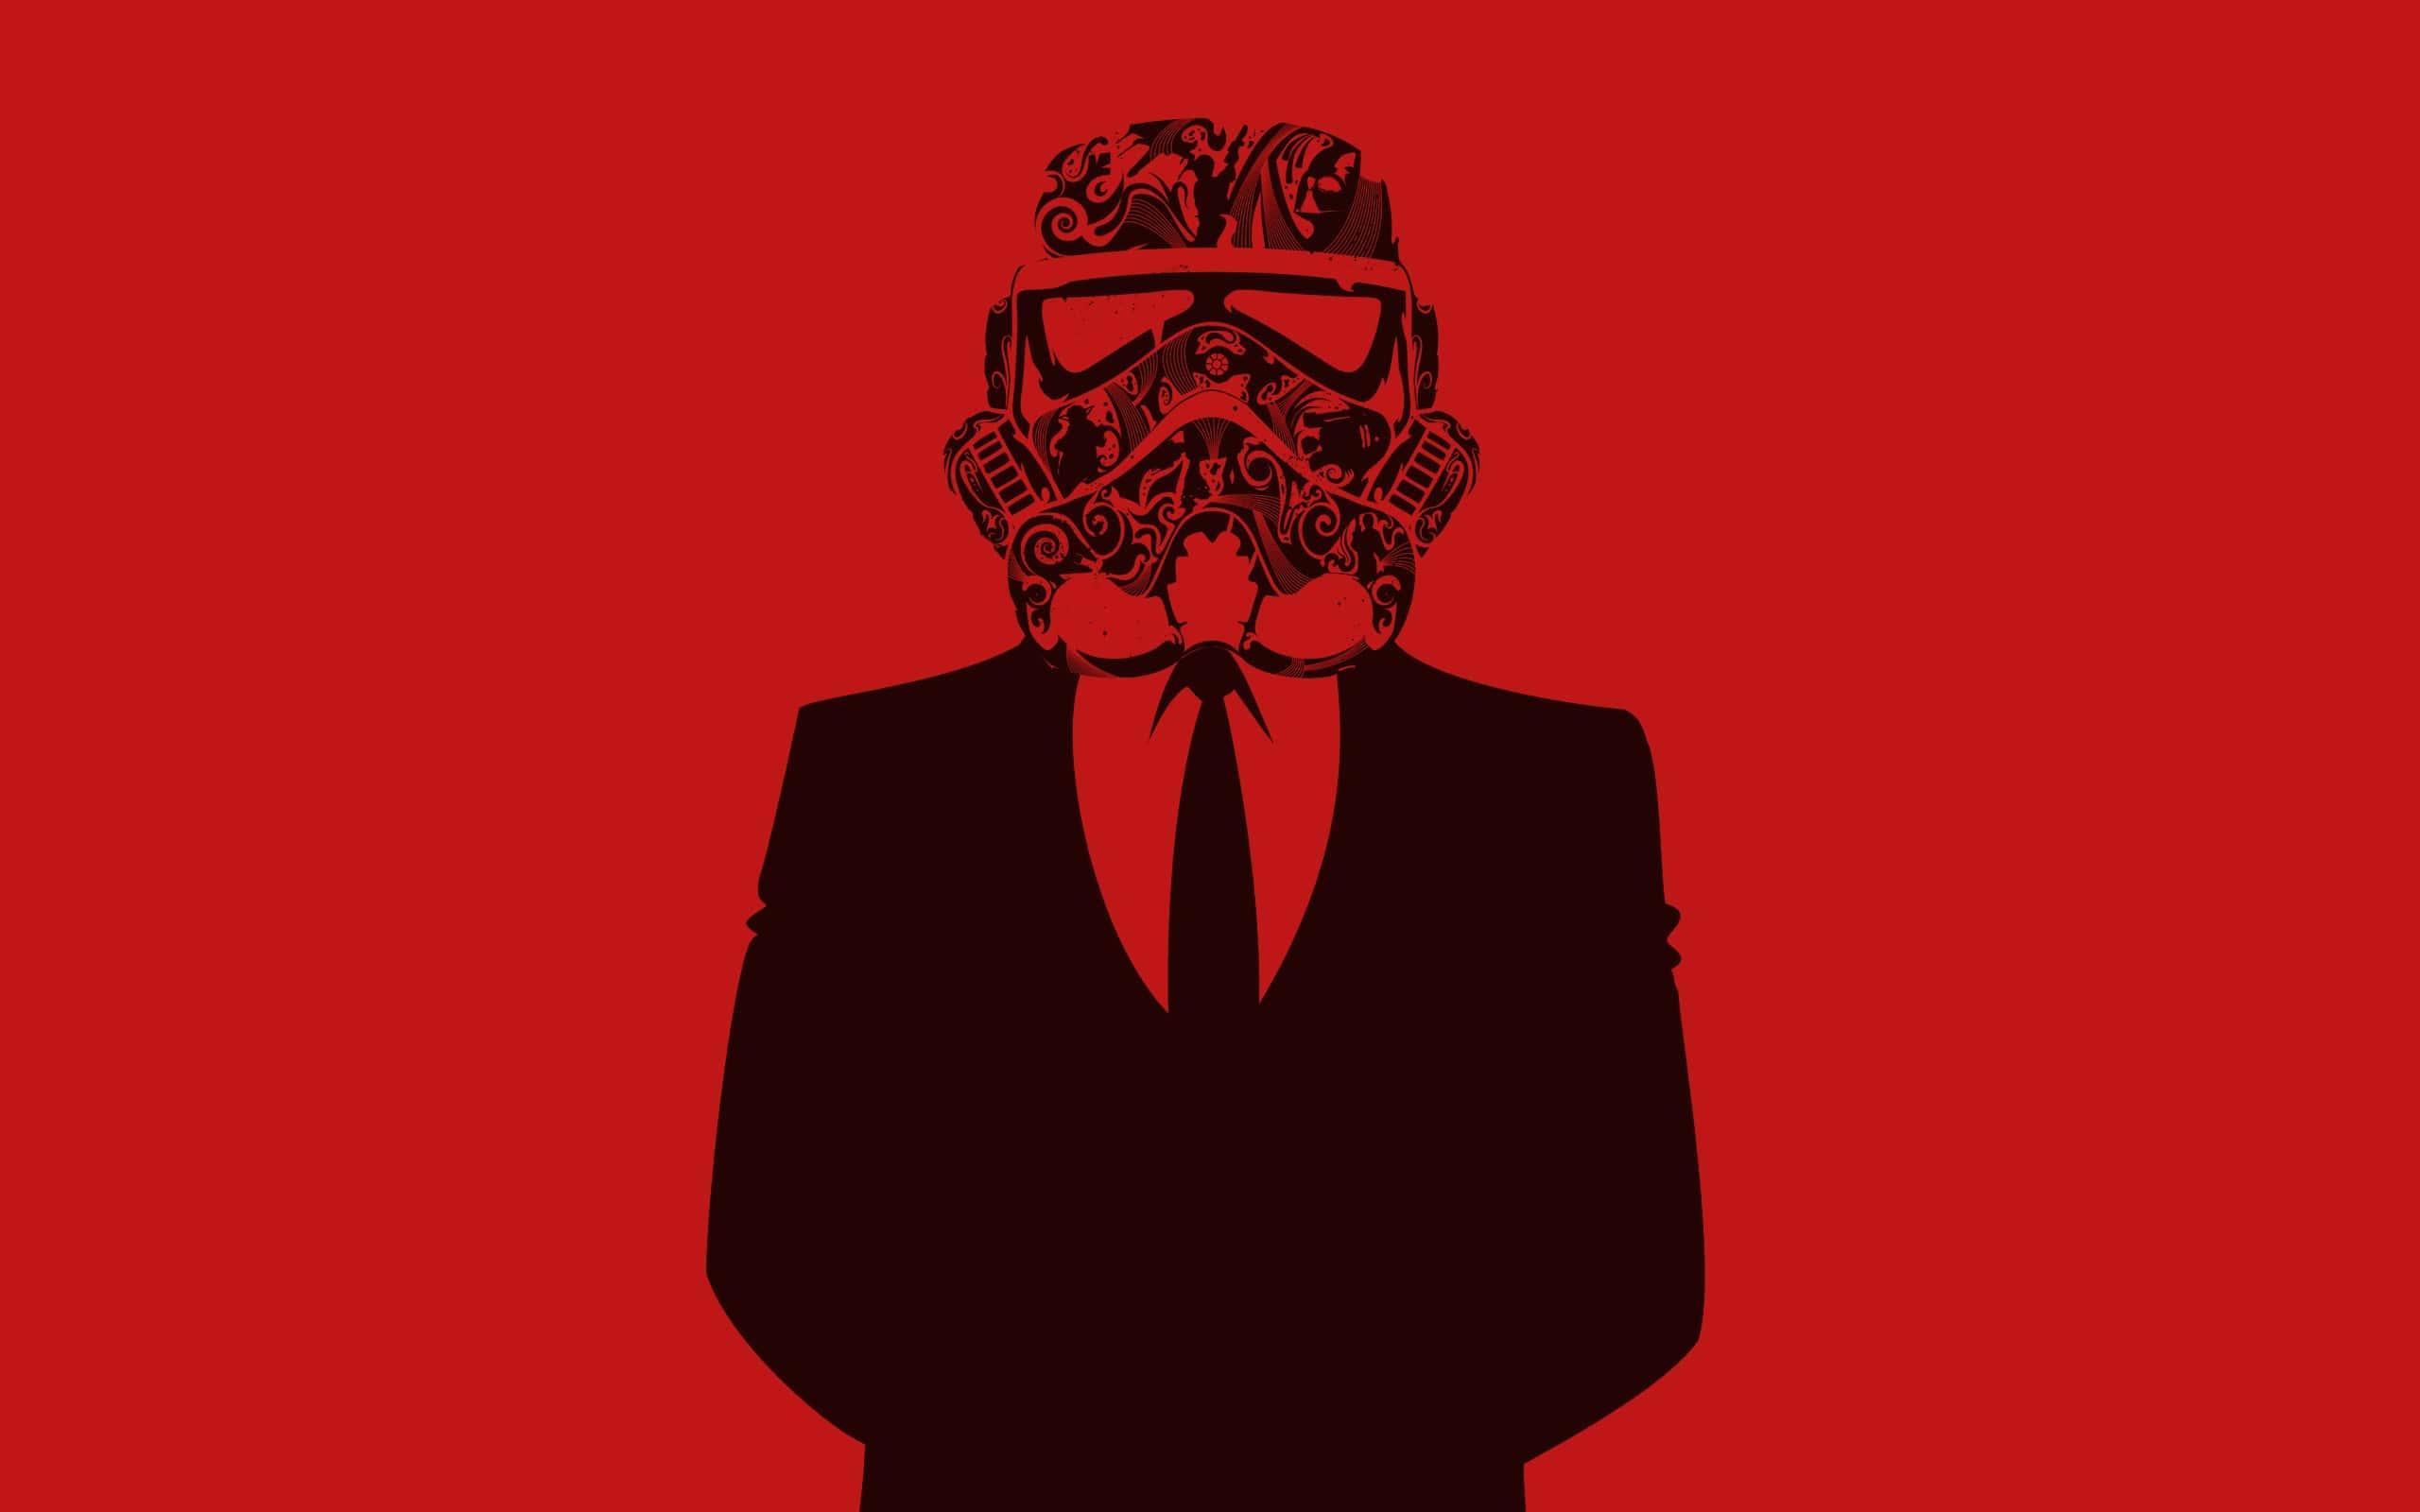 Star Wars Clone Wars Red Wallpaper Kolpaper Awesome Free Hd Wallpapers